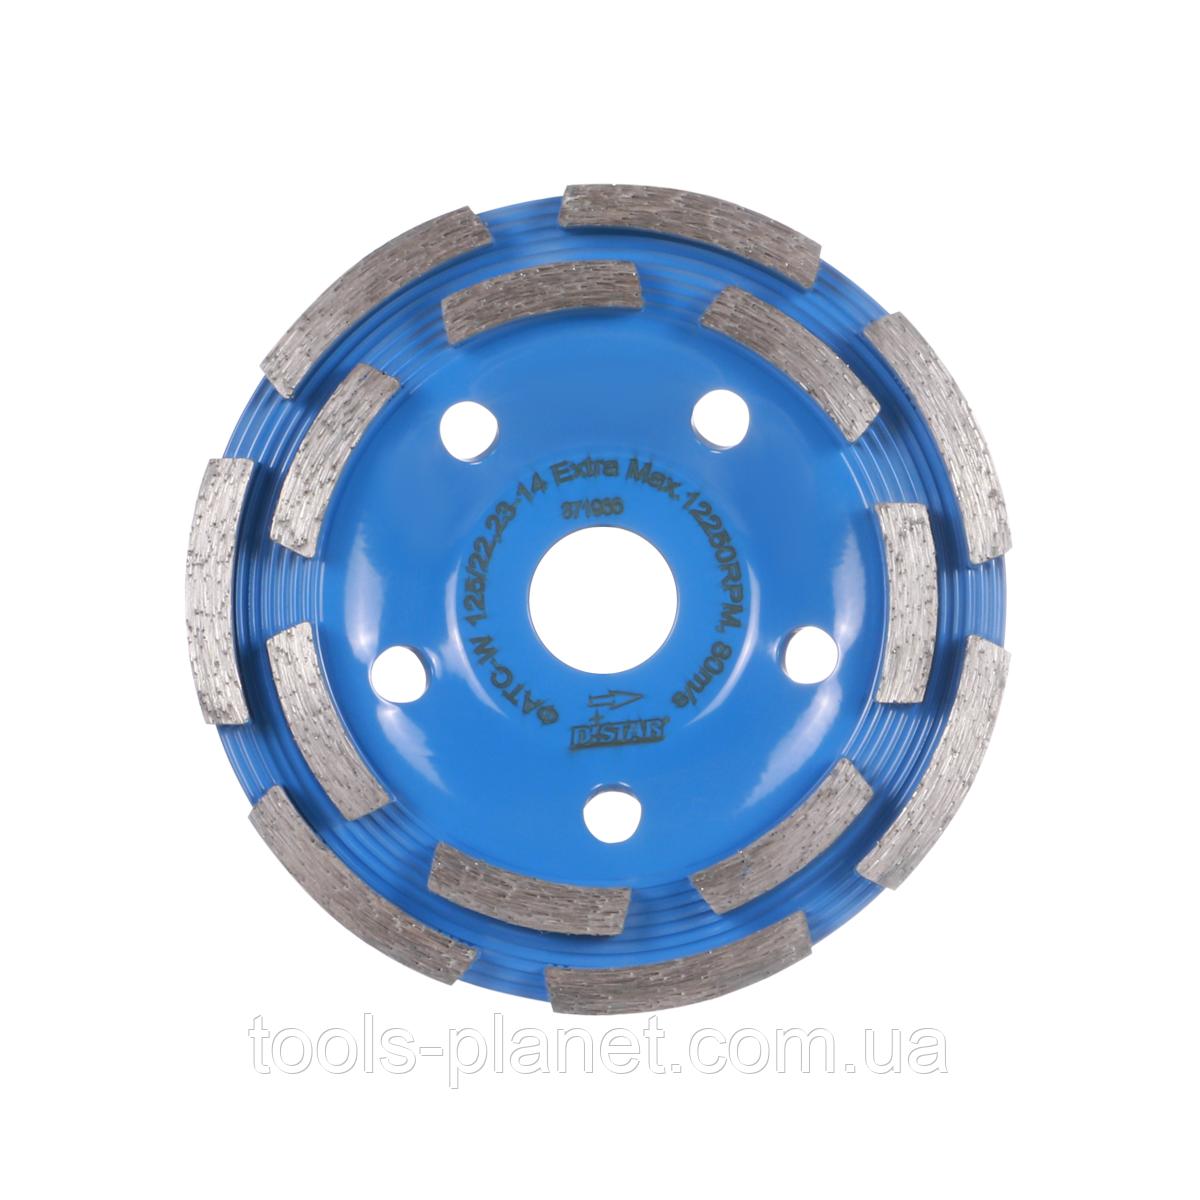 Алмазная чашка (фреза) по бетону Distar ФАТС-W 150 x 22,23 Extra MAX (16915516012)